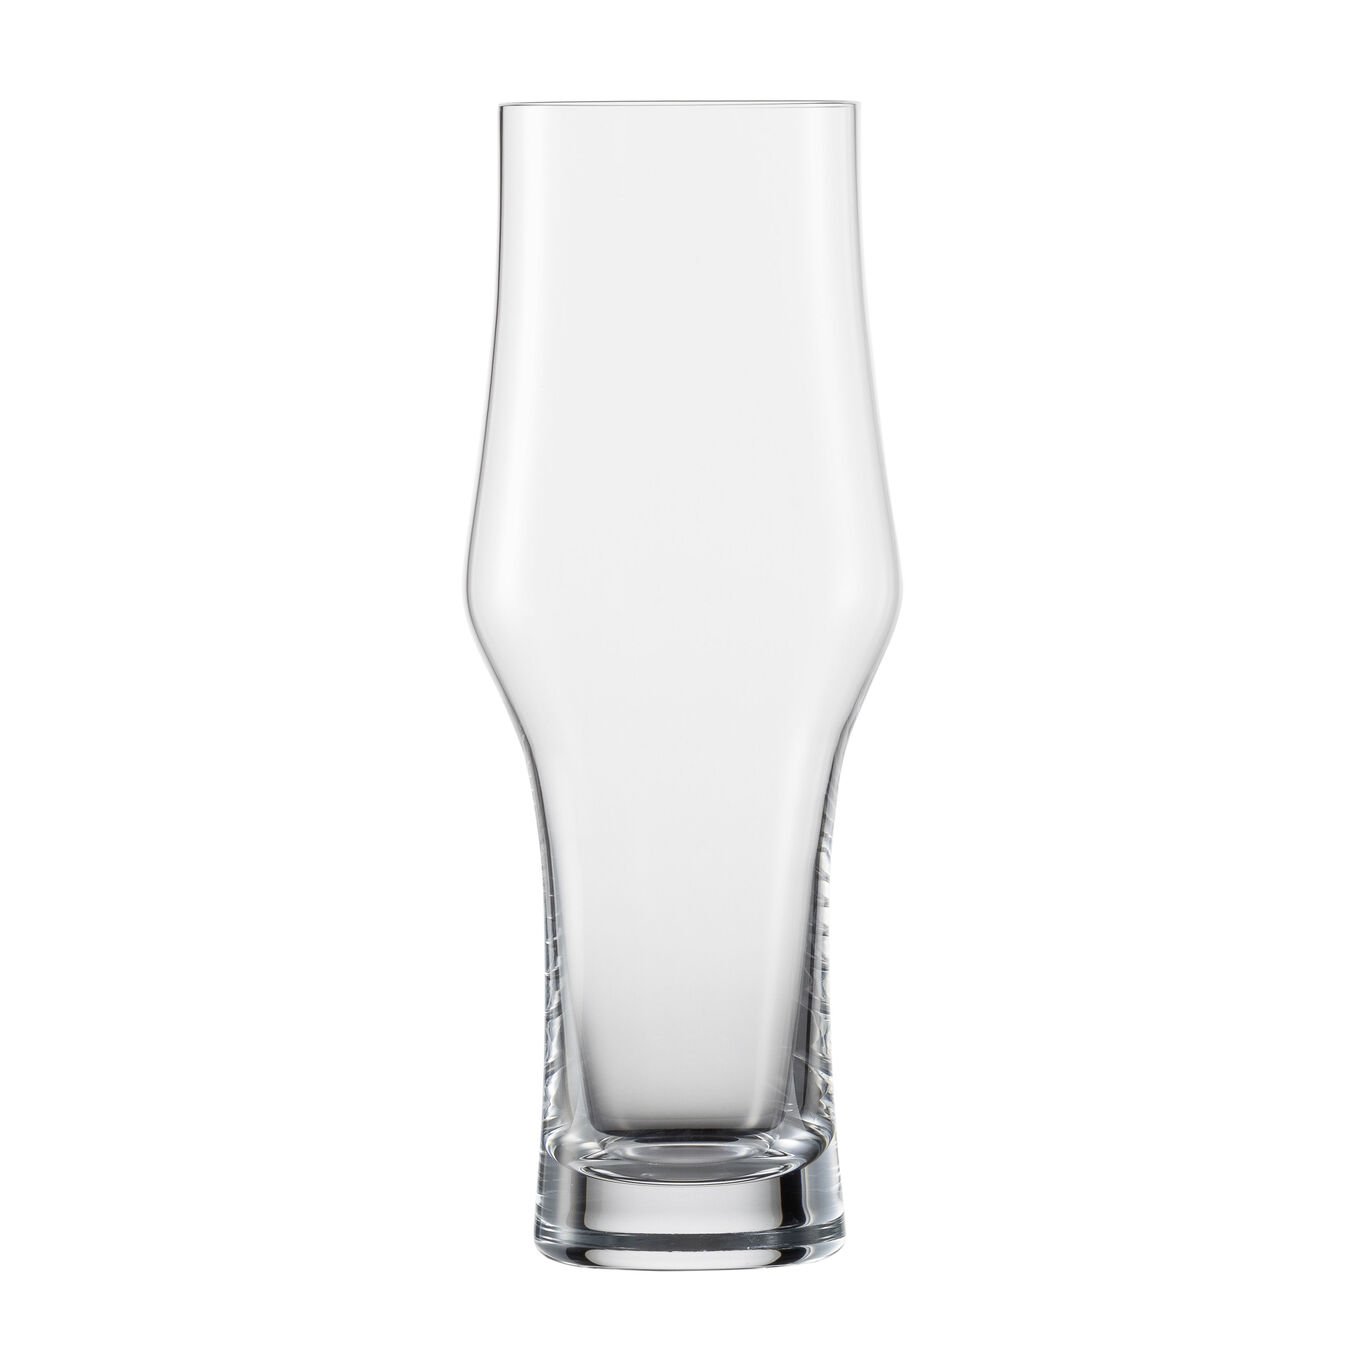 Copo para cerveja 360 ml,,large 1